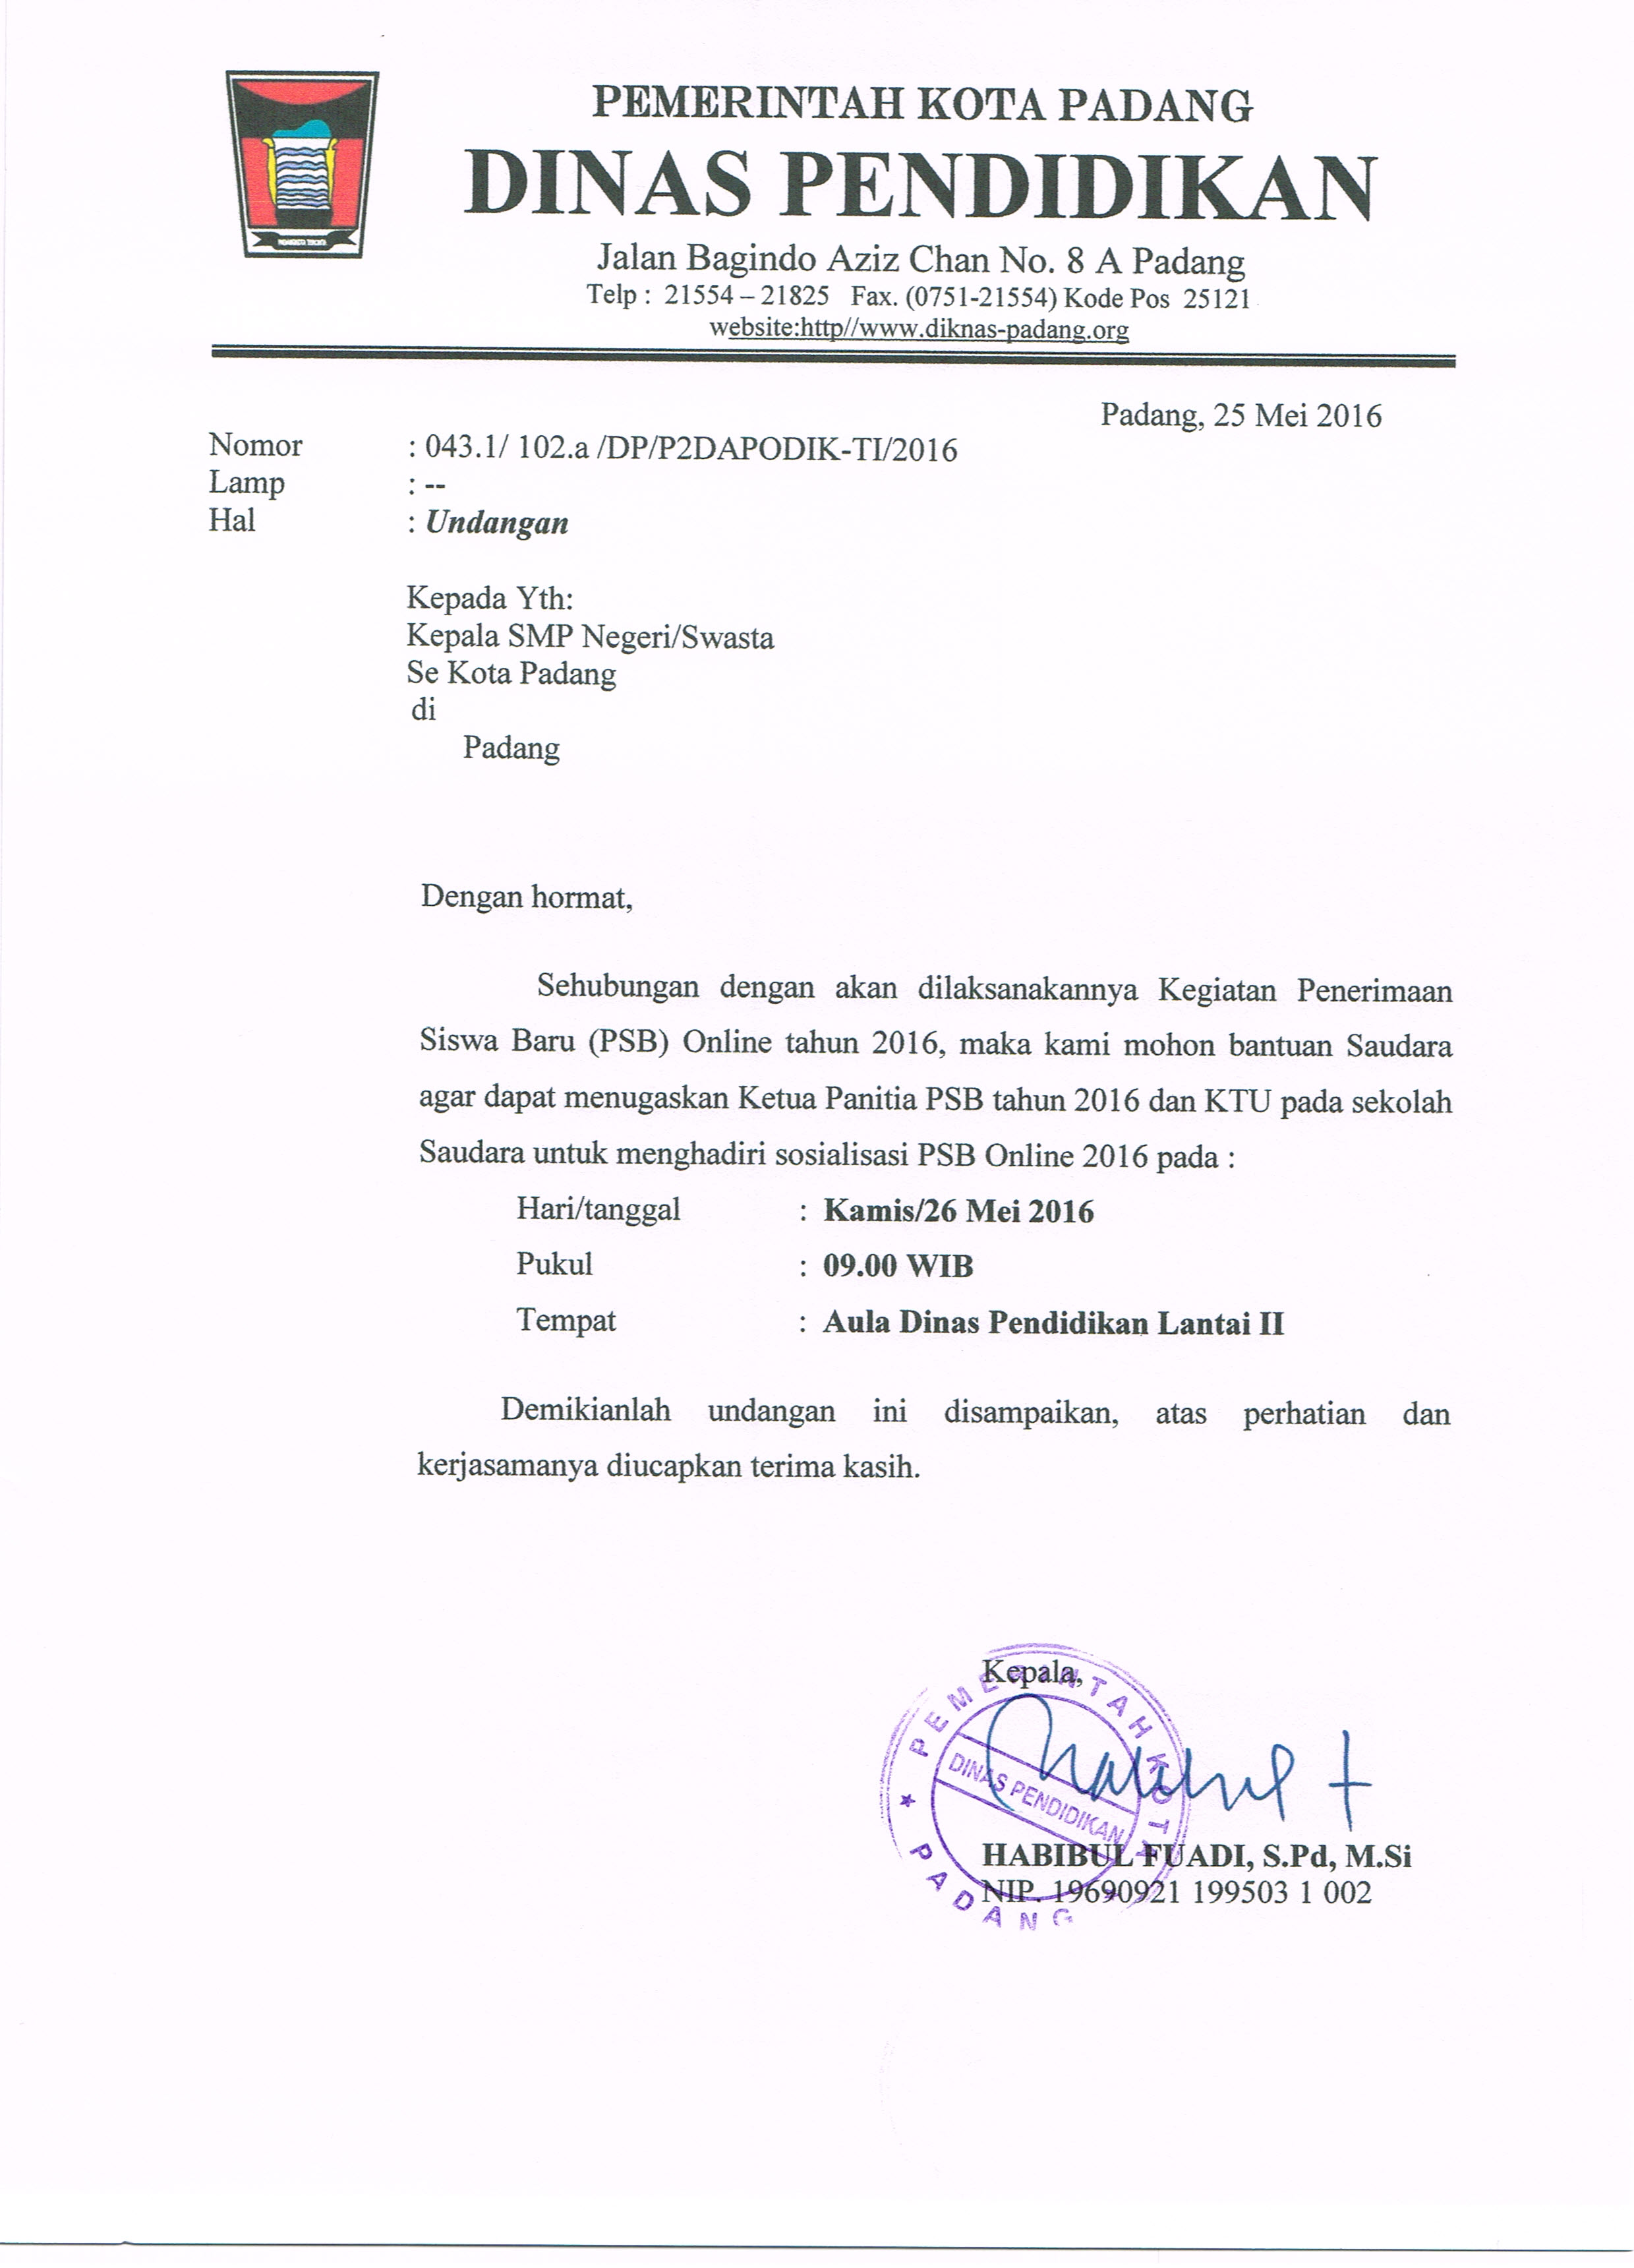 Berita Dinas Pendidikan Kota Padang